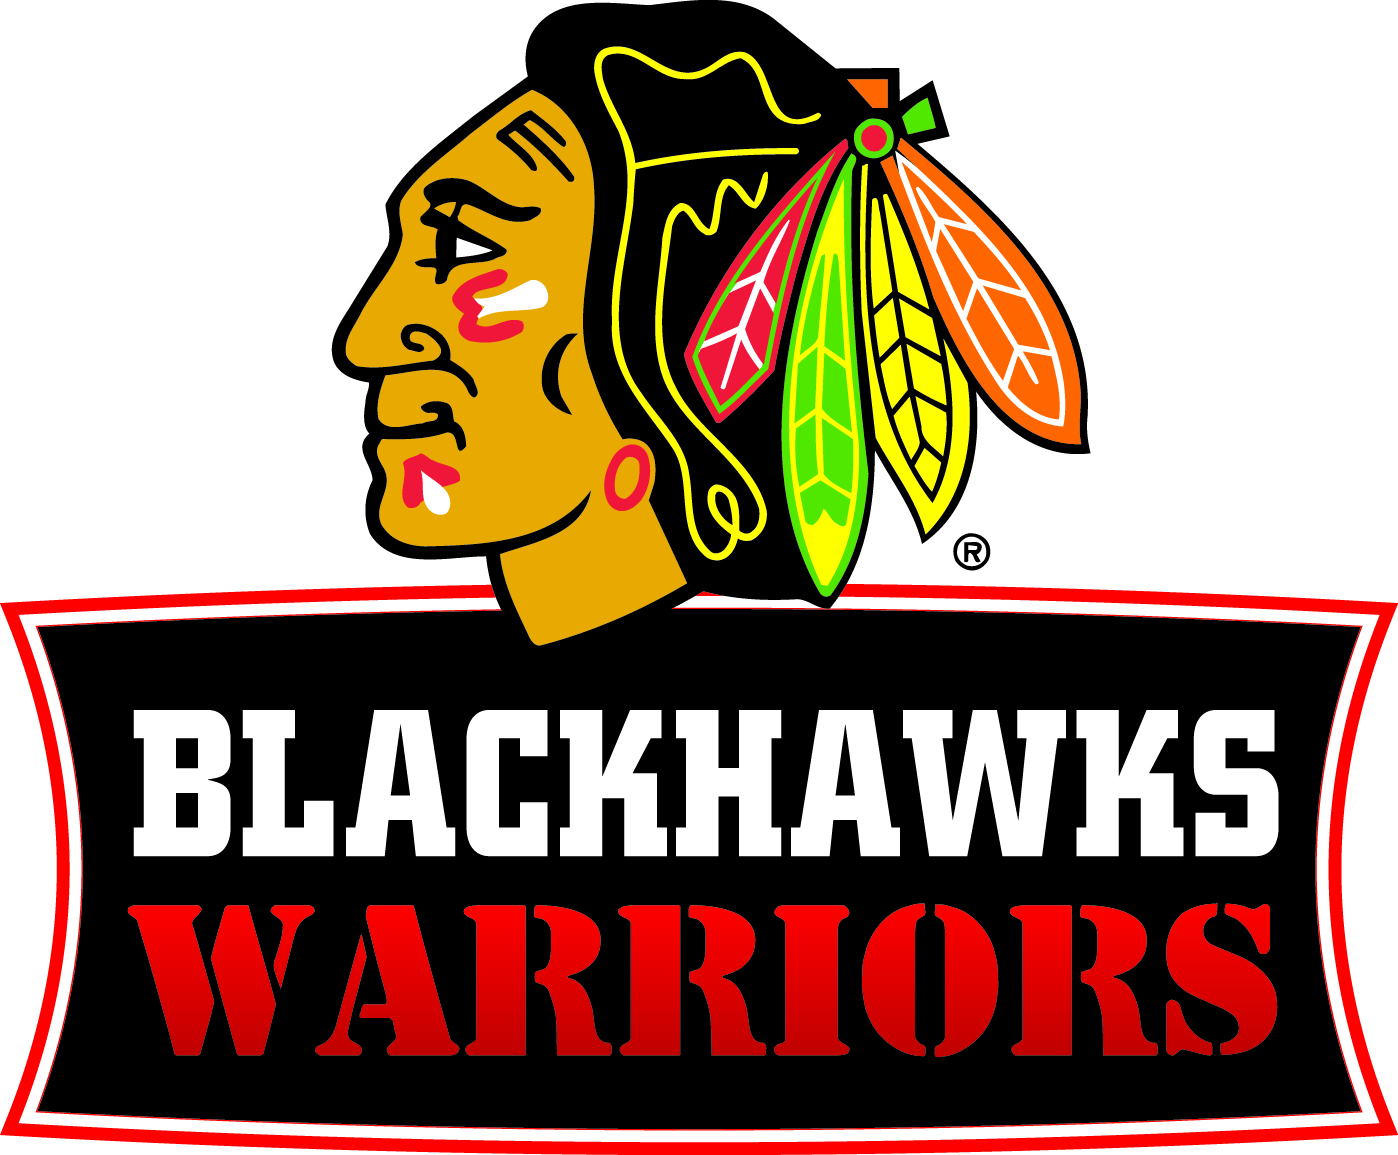 Amazing Chicago Blackhawks Pictures & Backgrounds